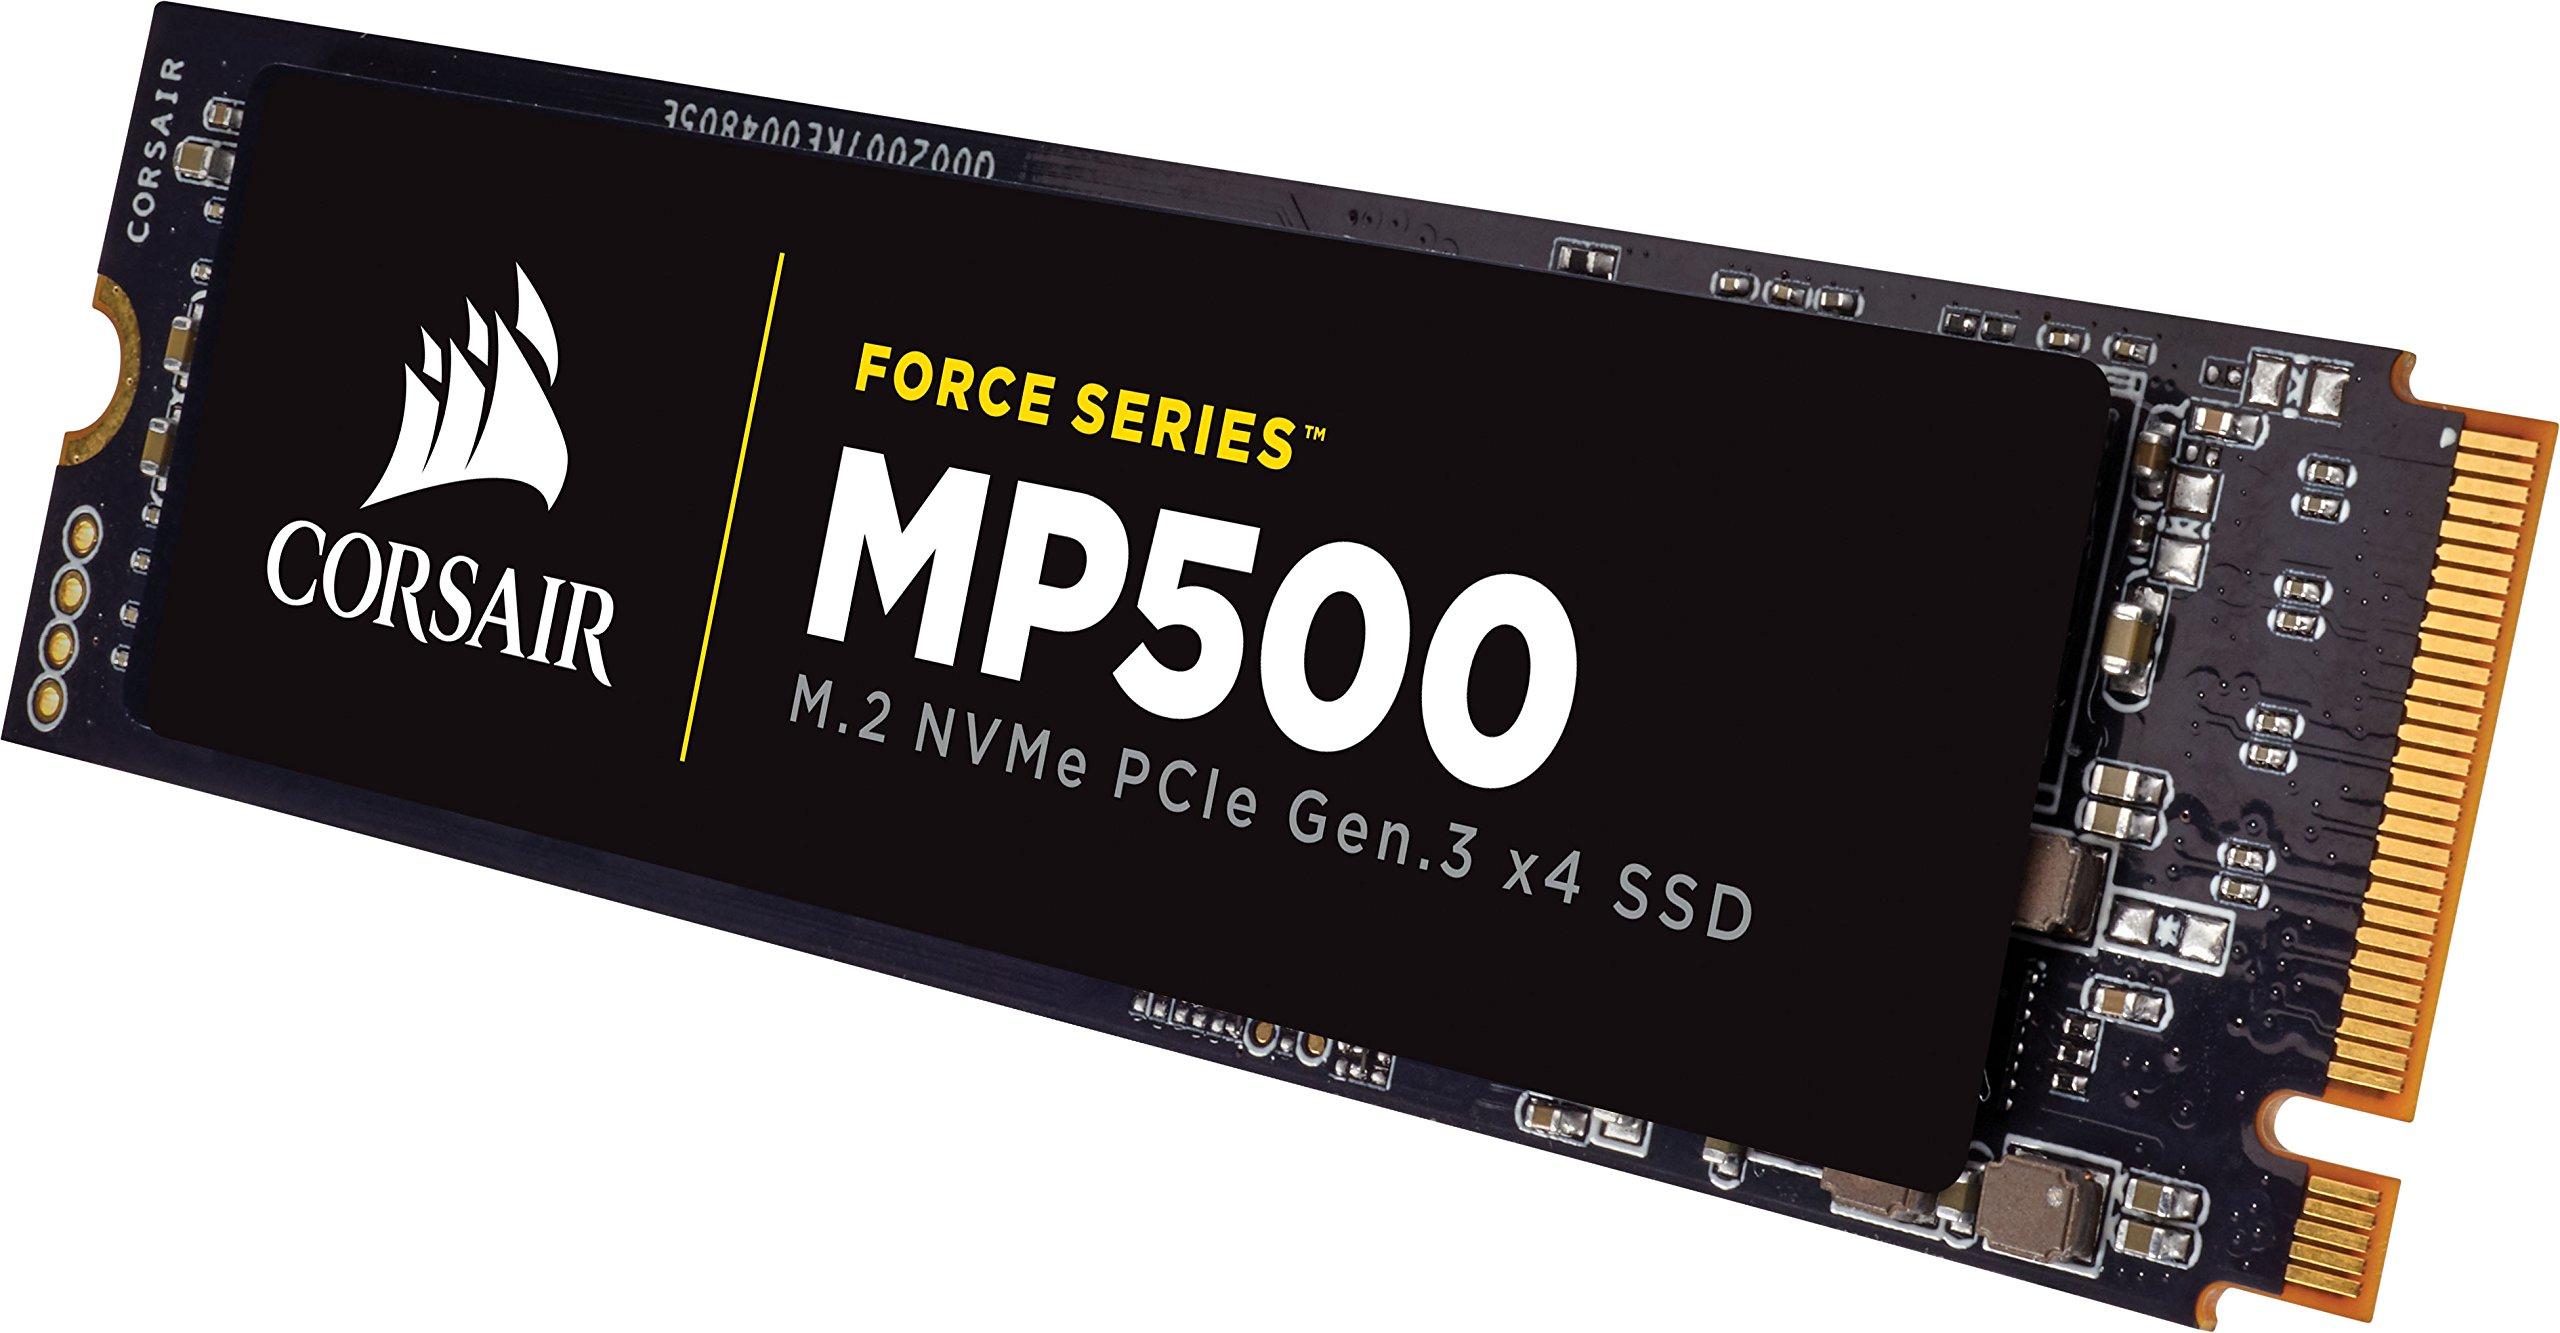 Corsair Force Series MP500 240GB M.2 NVMe PCIe Gen. 3 x4 SSD by Corsair (Image #1)